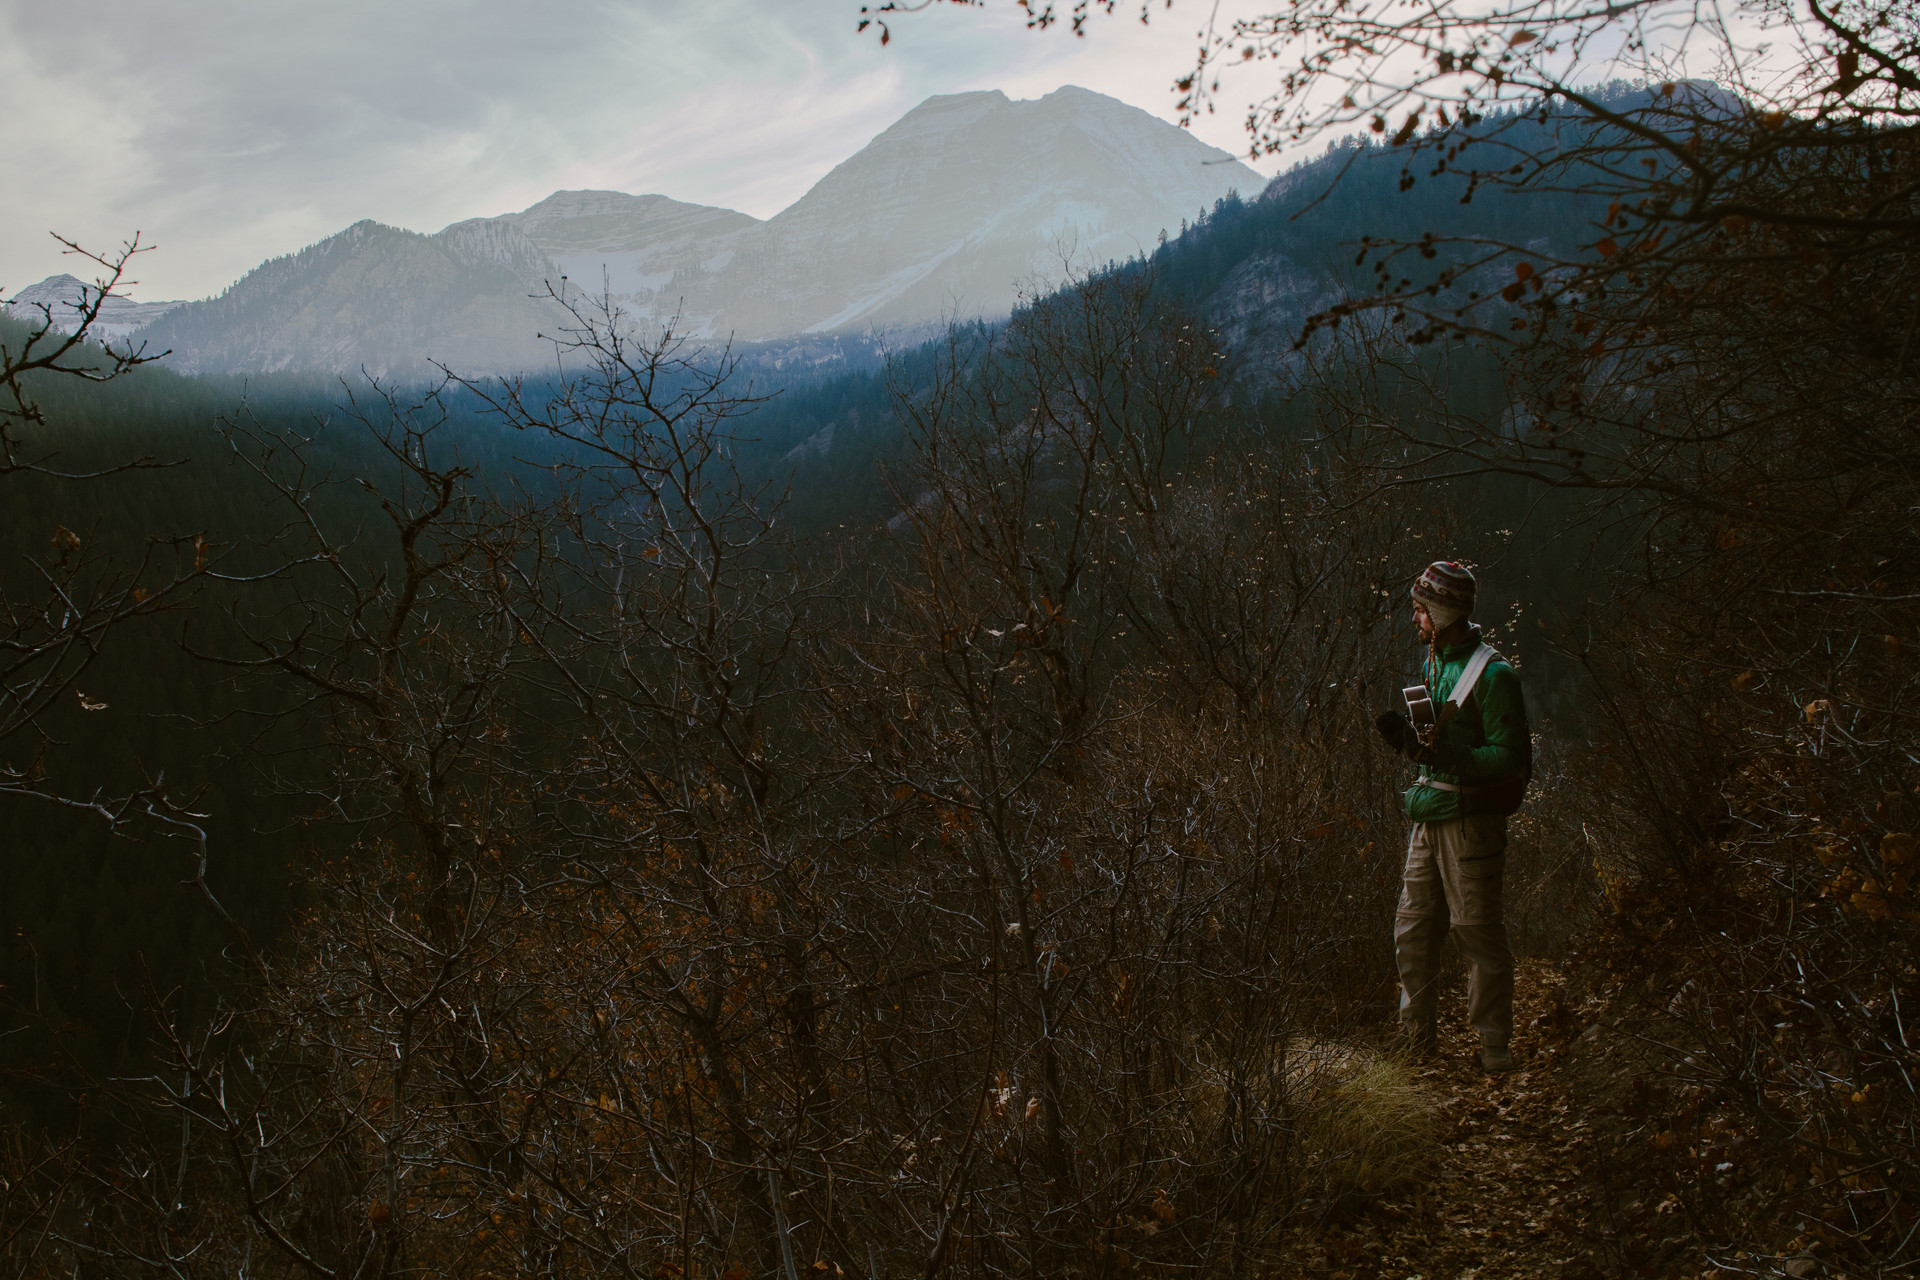 Joe and Mt. Timpanogos